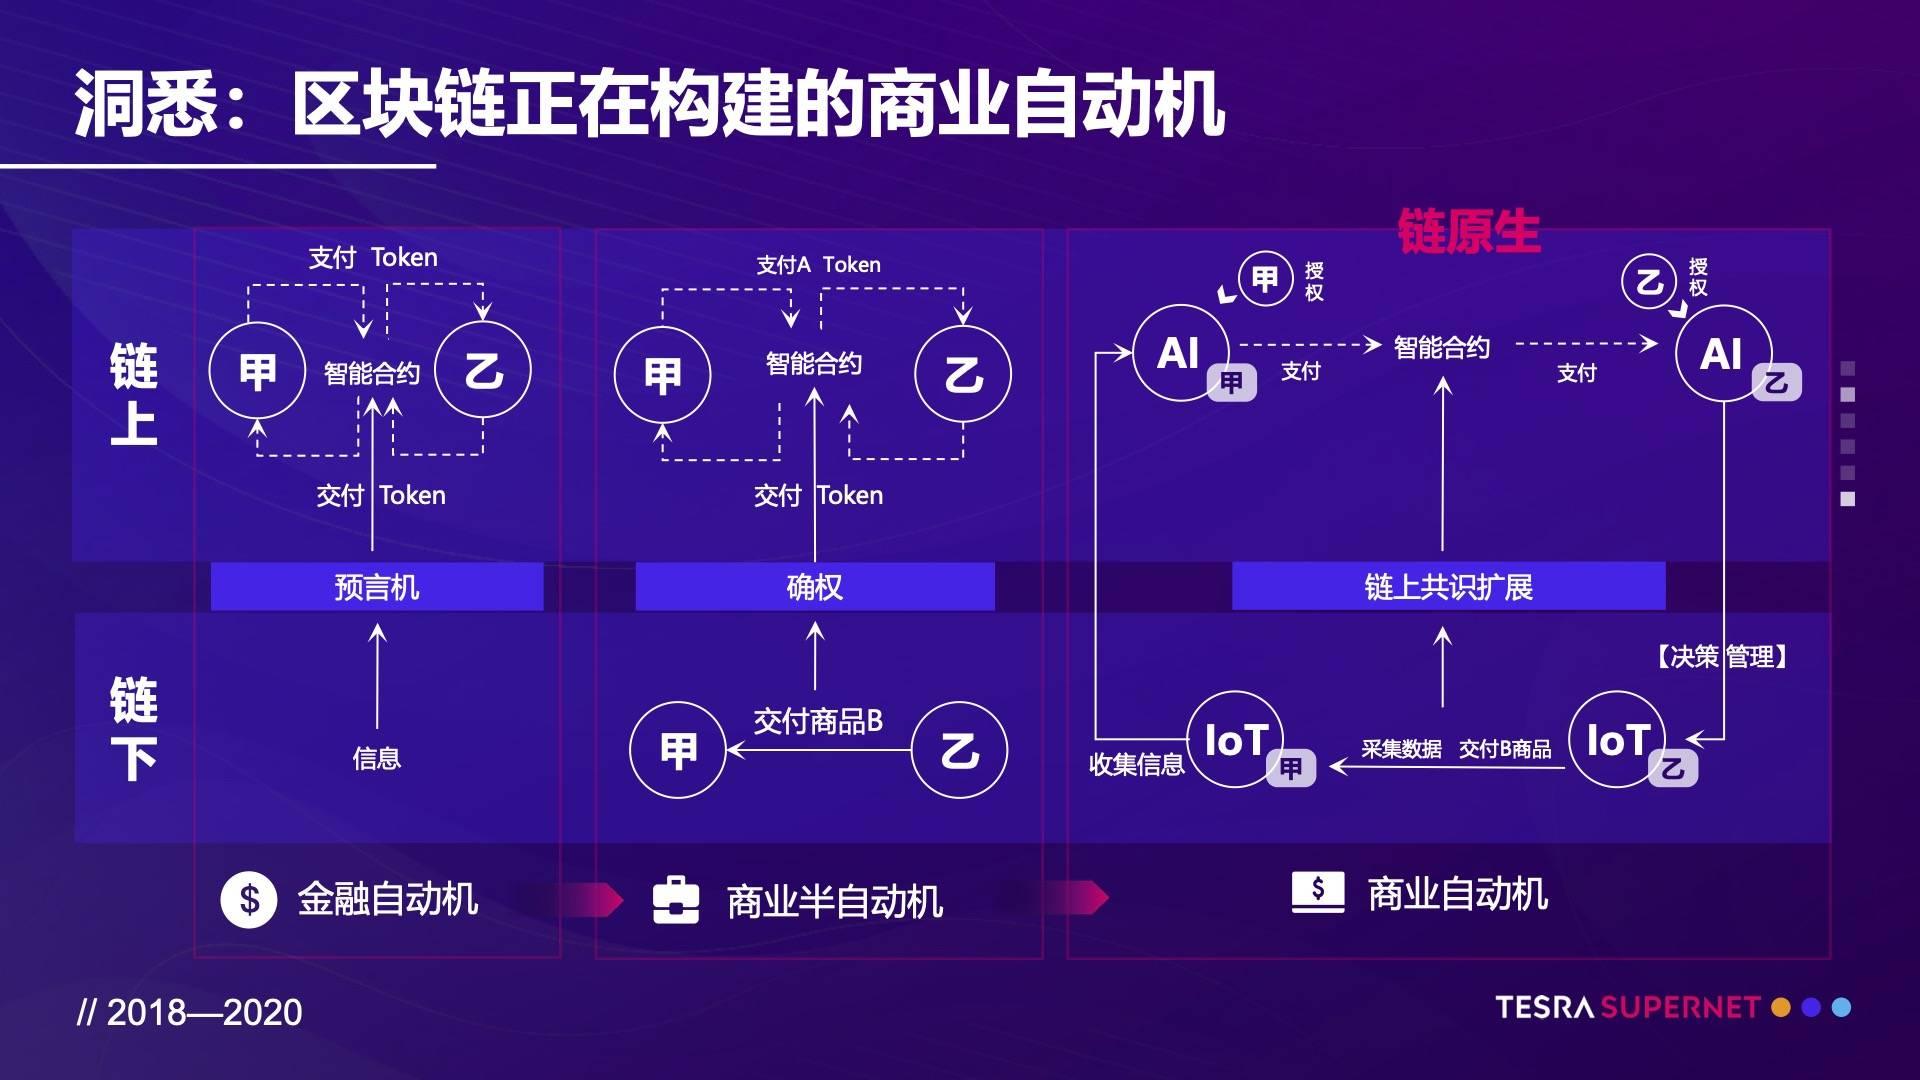 Tesra兰毅:开放商业世界的计算智能丨世界区块链大会·武汉